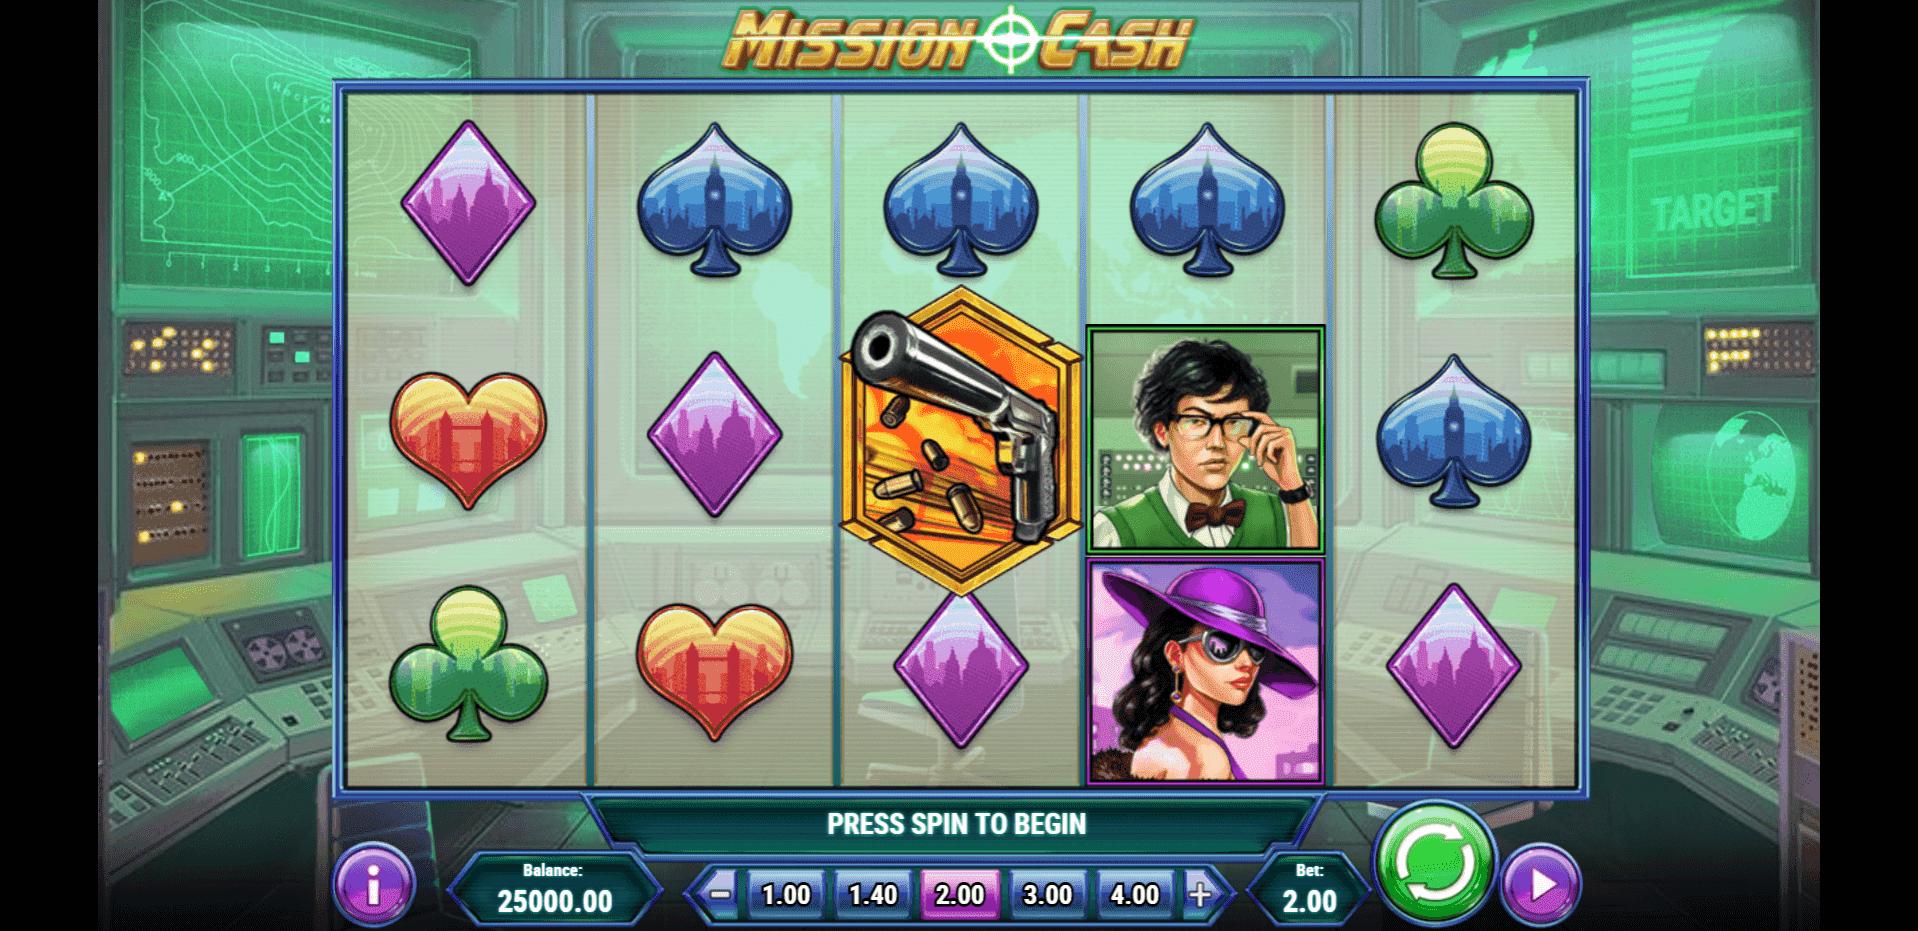 Mission Cash slot machine screenshot